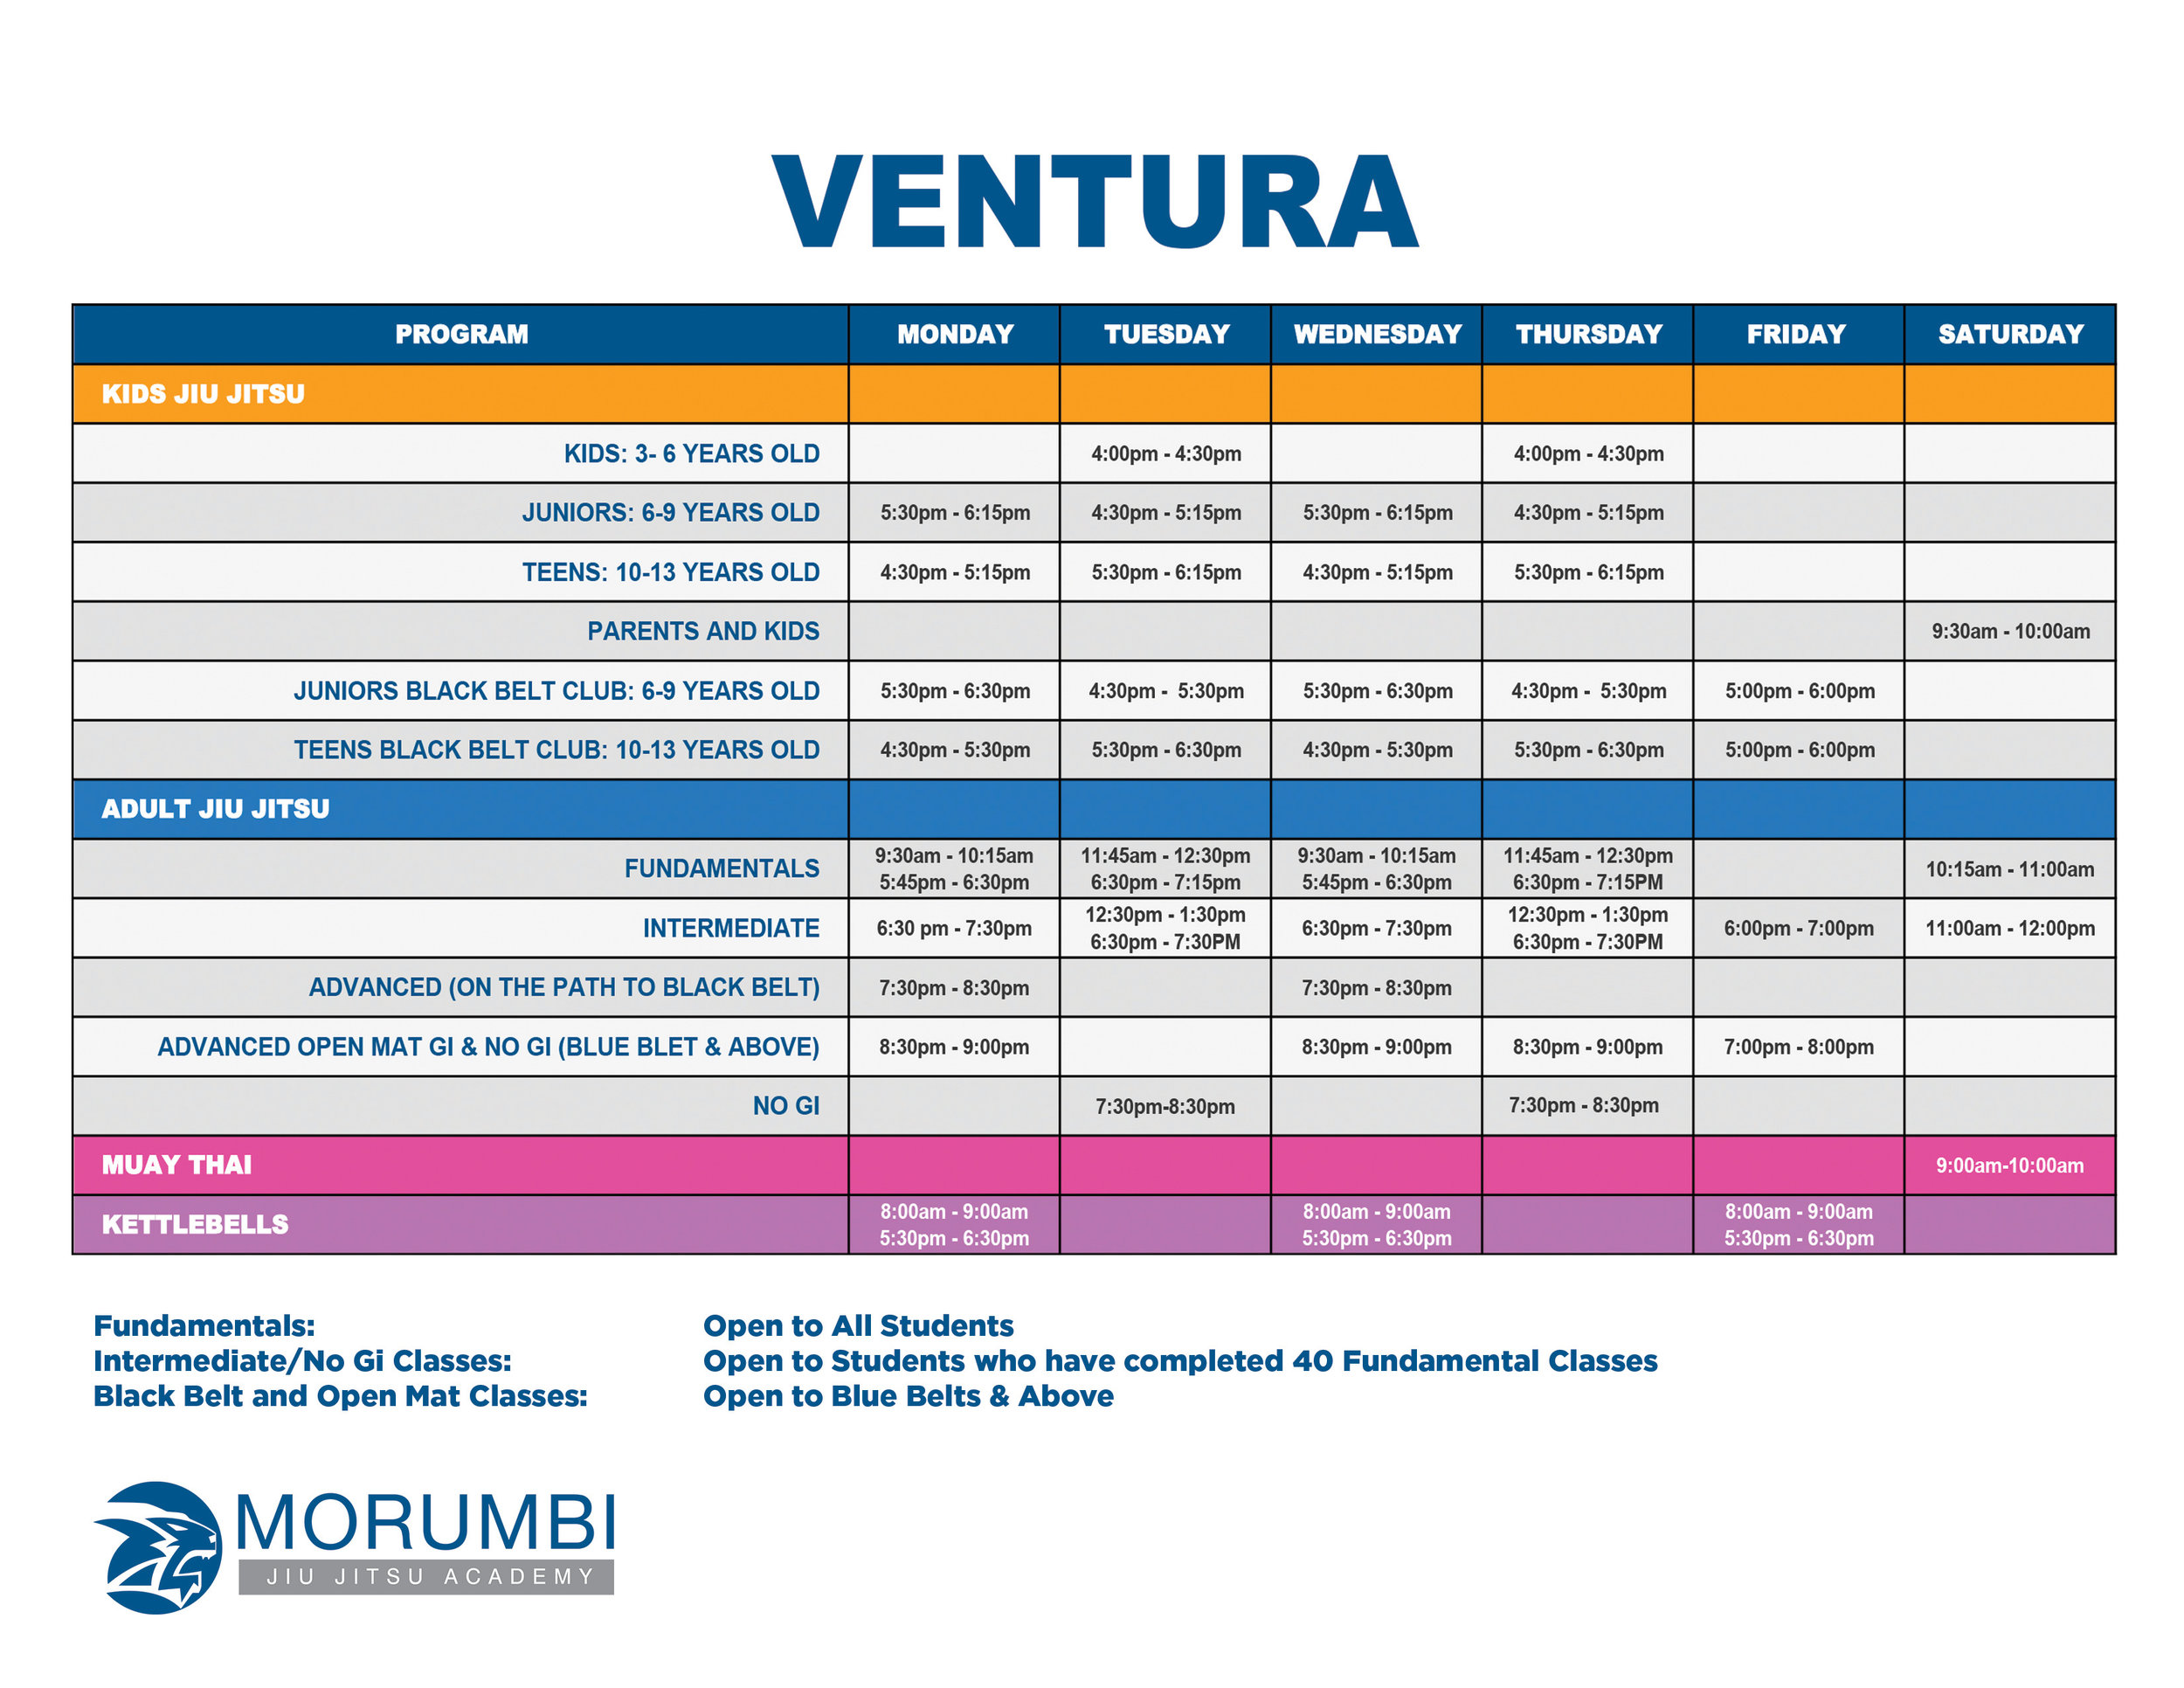 Morumbi-Jiu-Jitsu-Fitness-Academy-Ventura_Schedule-12-2018.jpg